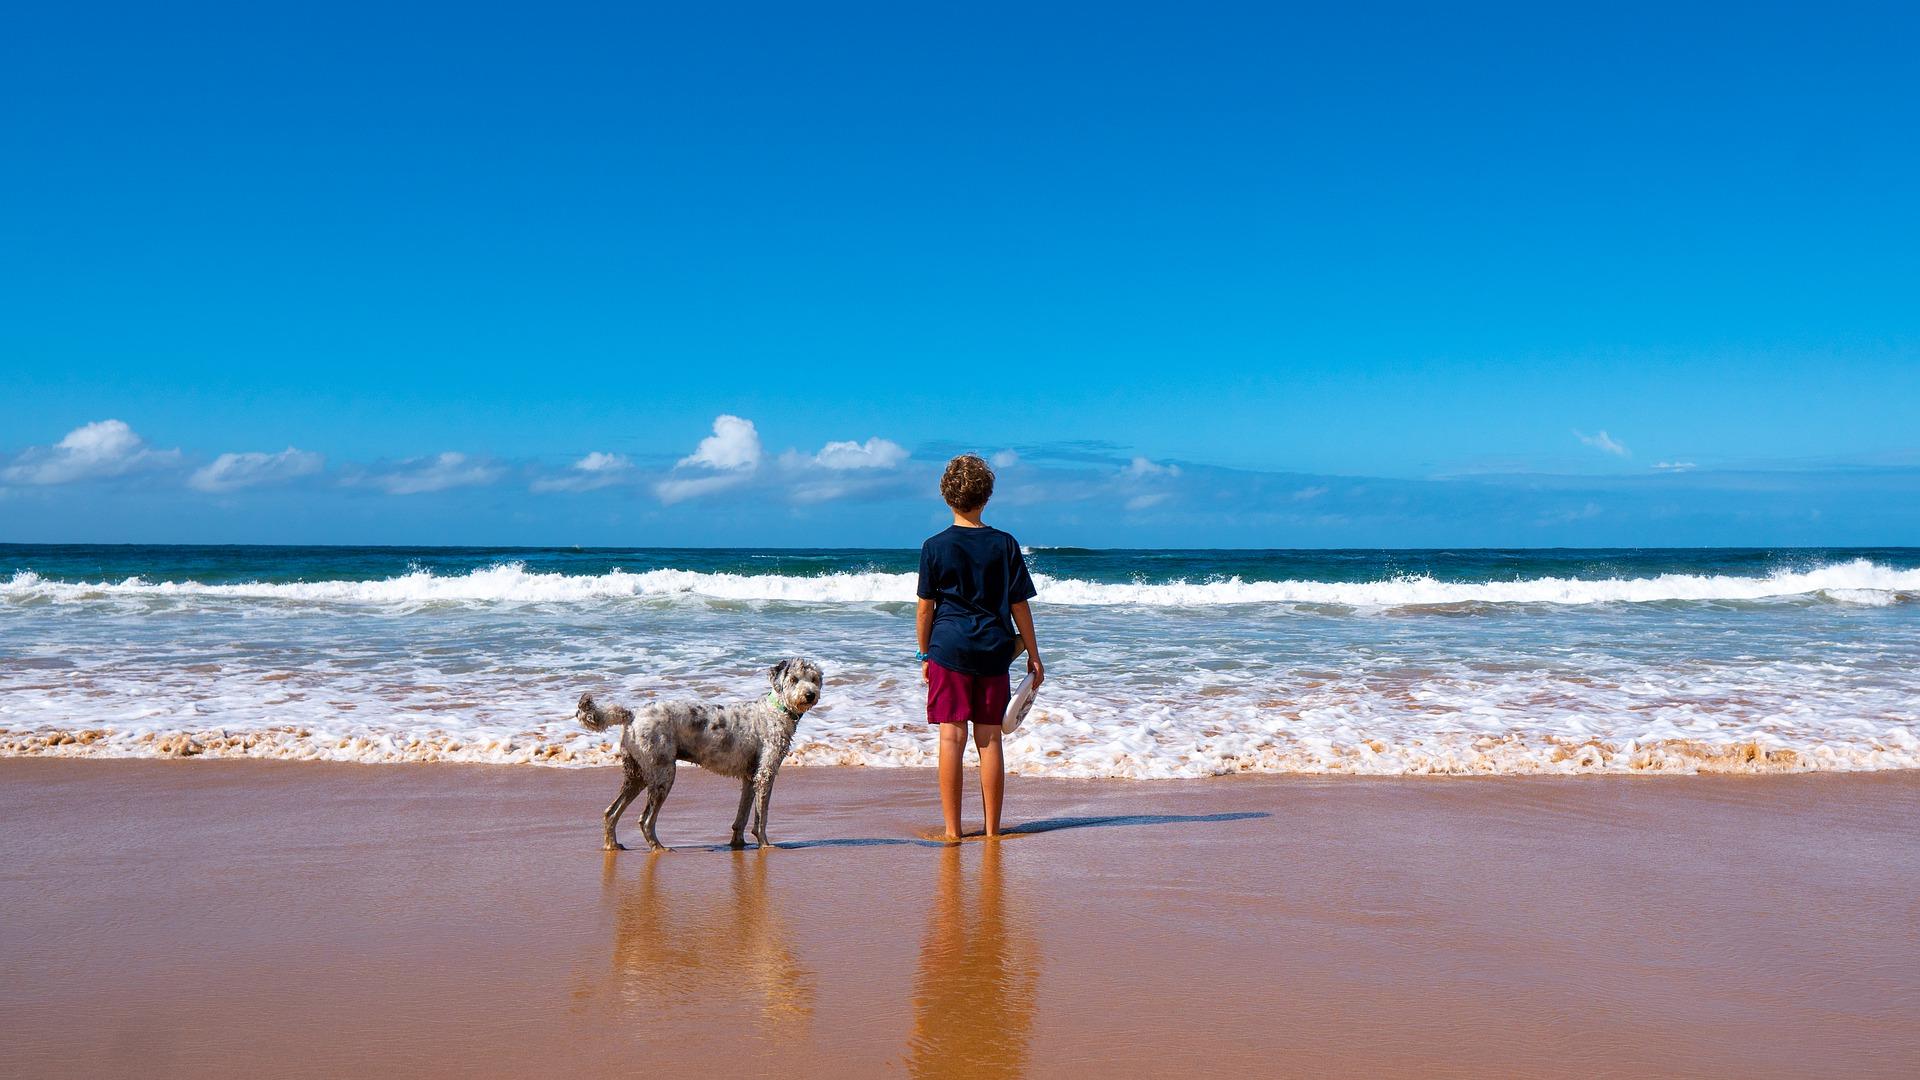 beach dog frisbee boy pixabay